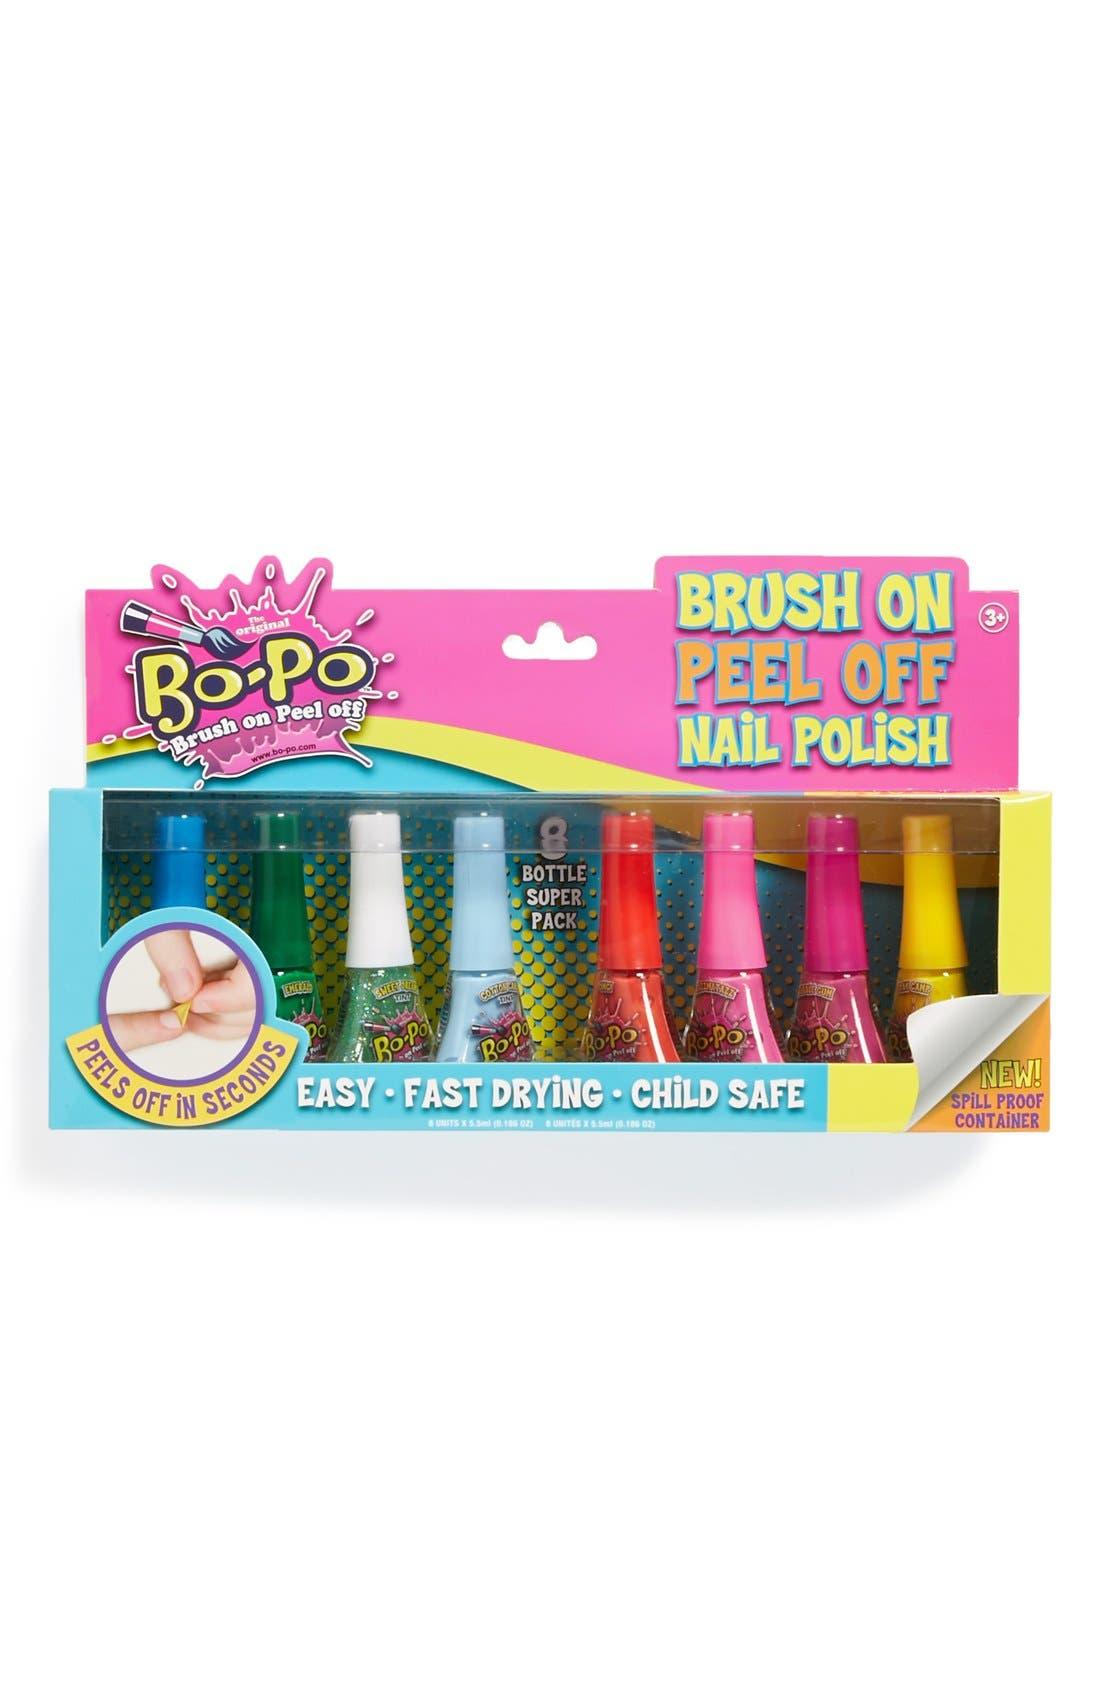 Alternate Image 1 Selected - Bo-Po Peel Off Nail Polish (Set of 8)